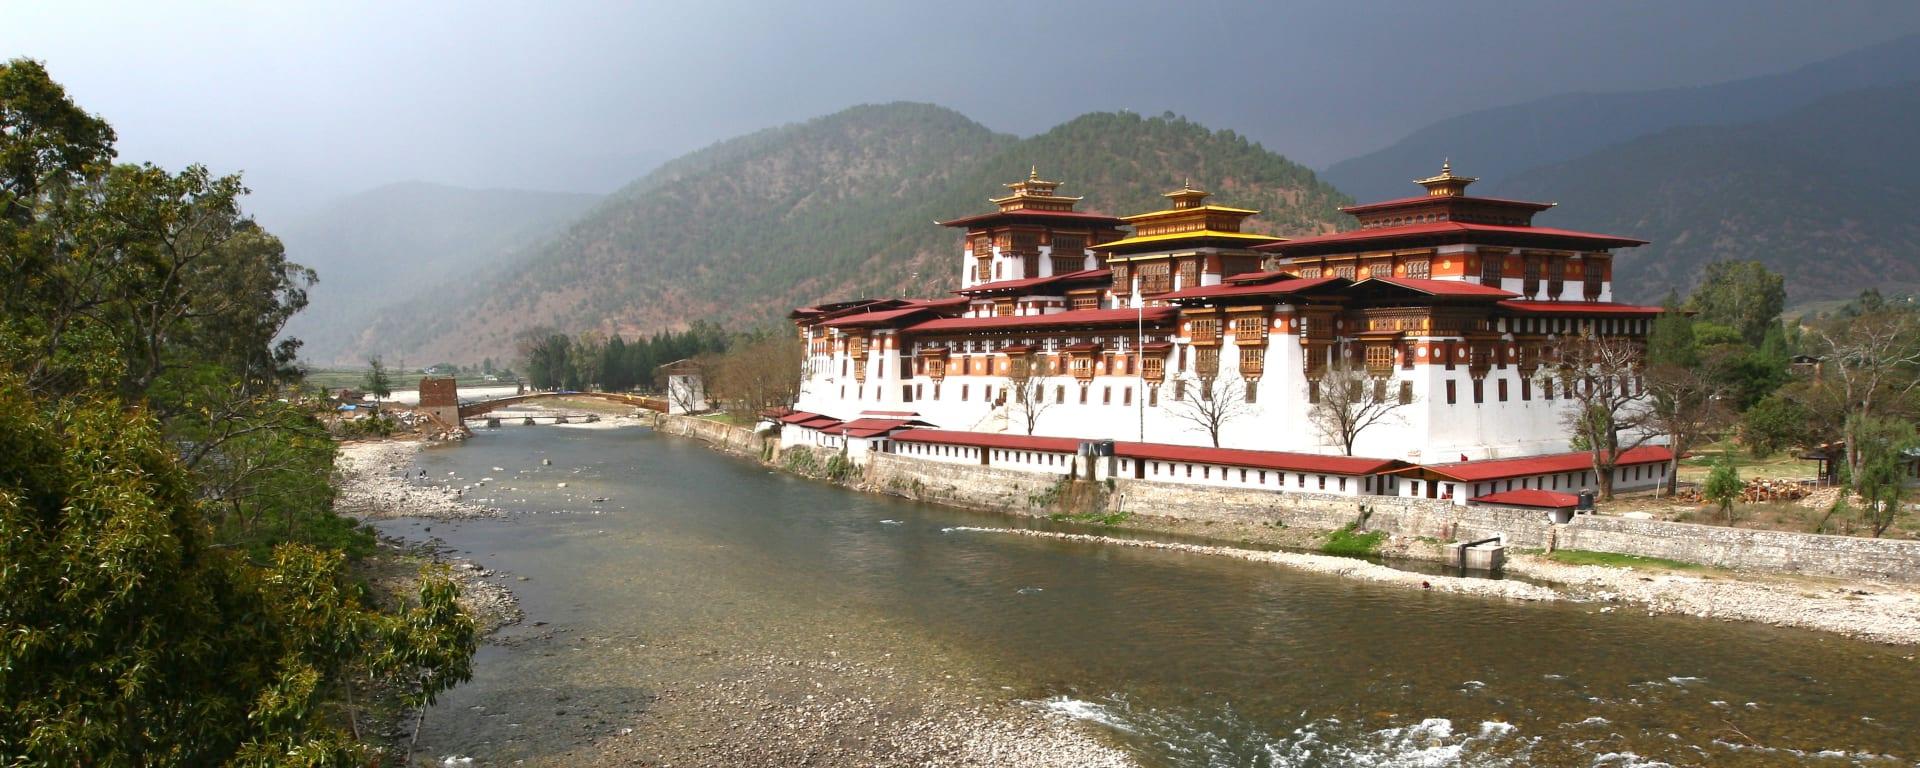 Bhutan entdecken mit Tischler Reisen: Bhutan Punakha Dzong